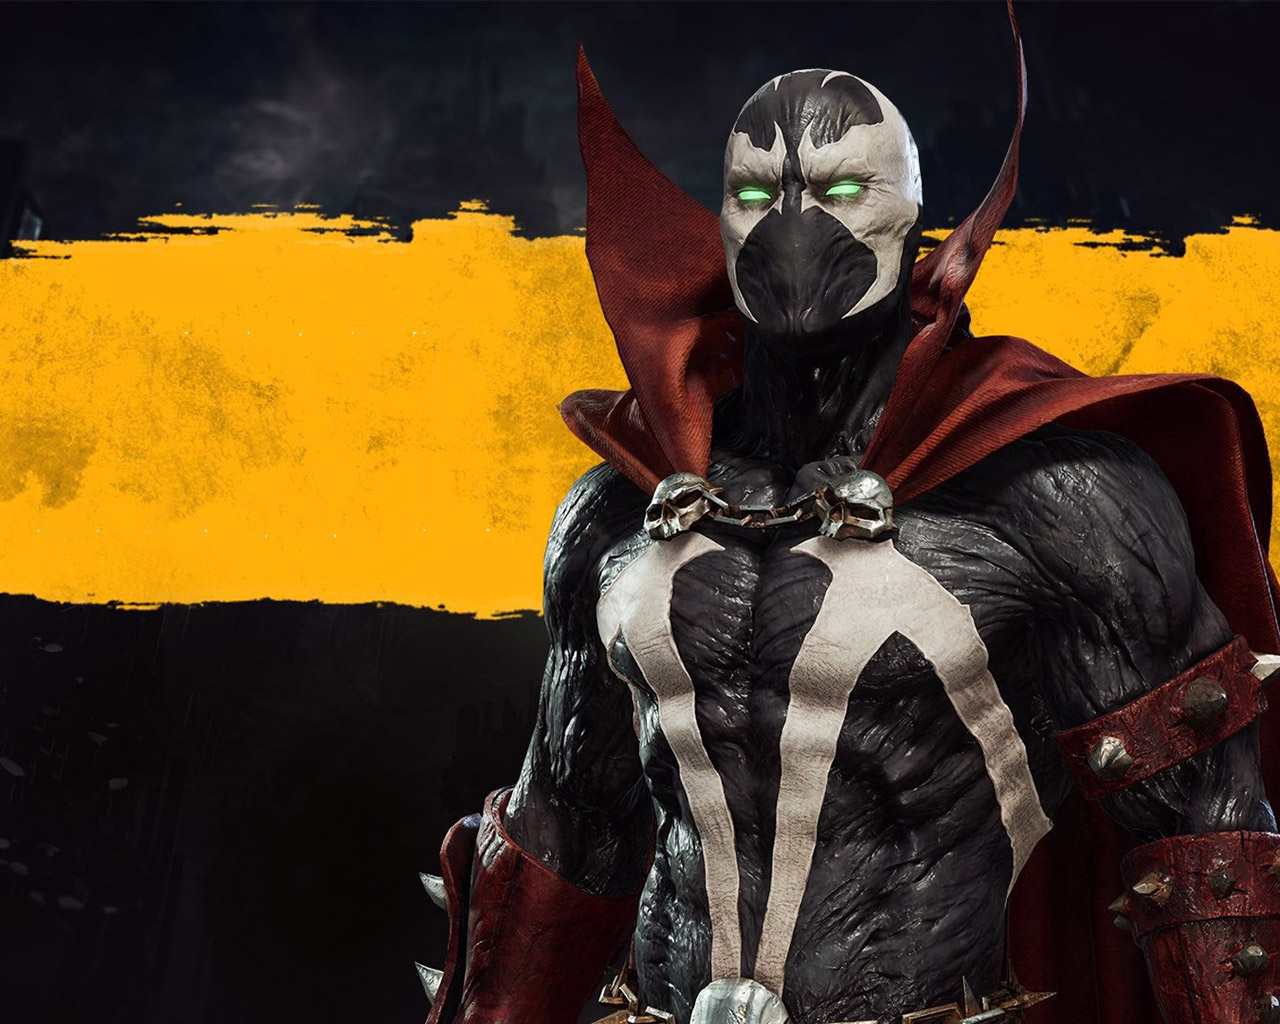 Mortal Kombat 11 Wallpaper in 1280x1024